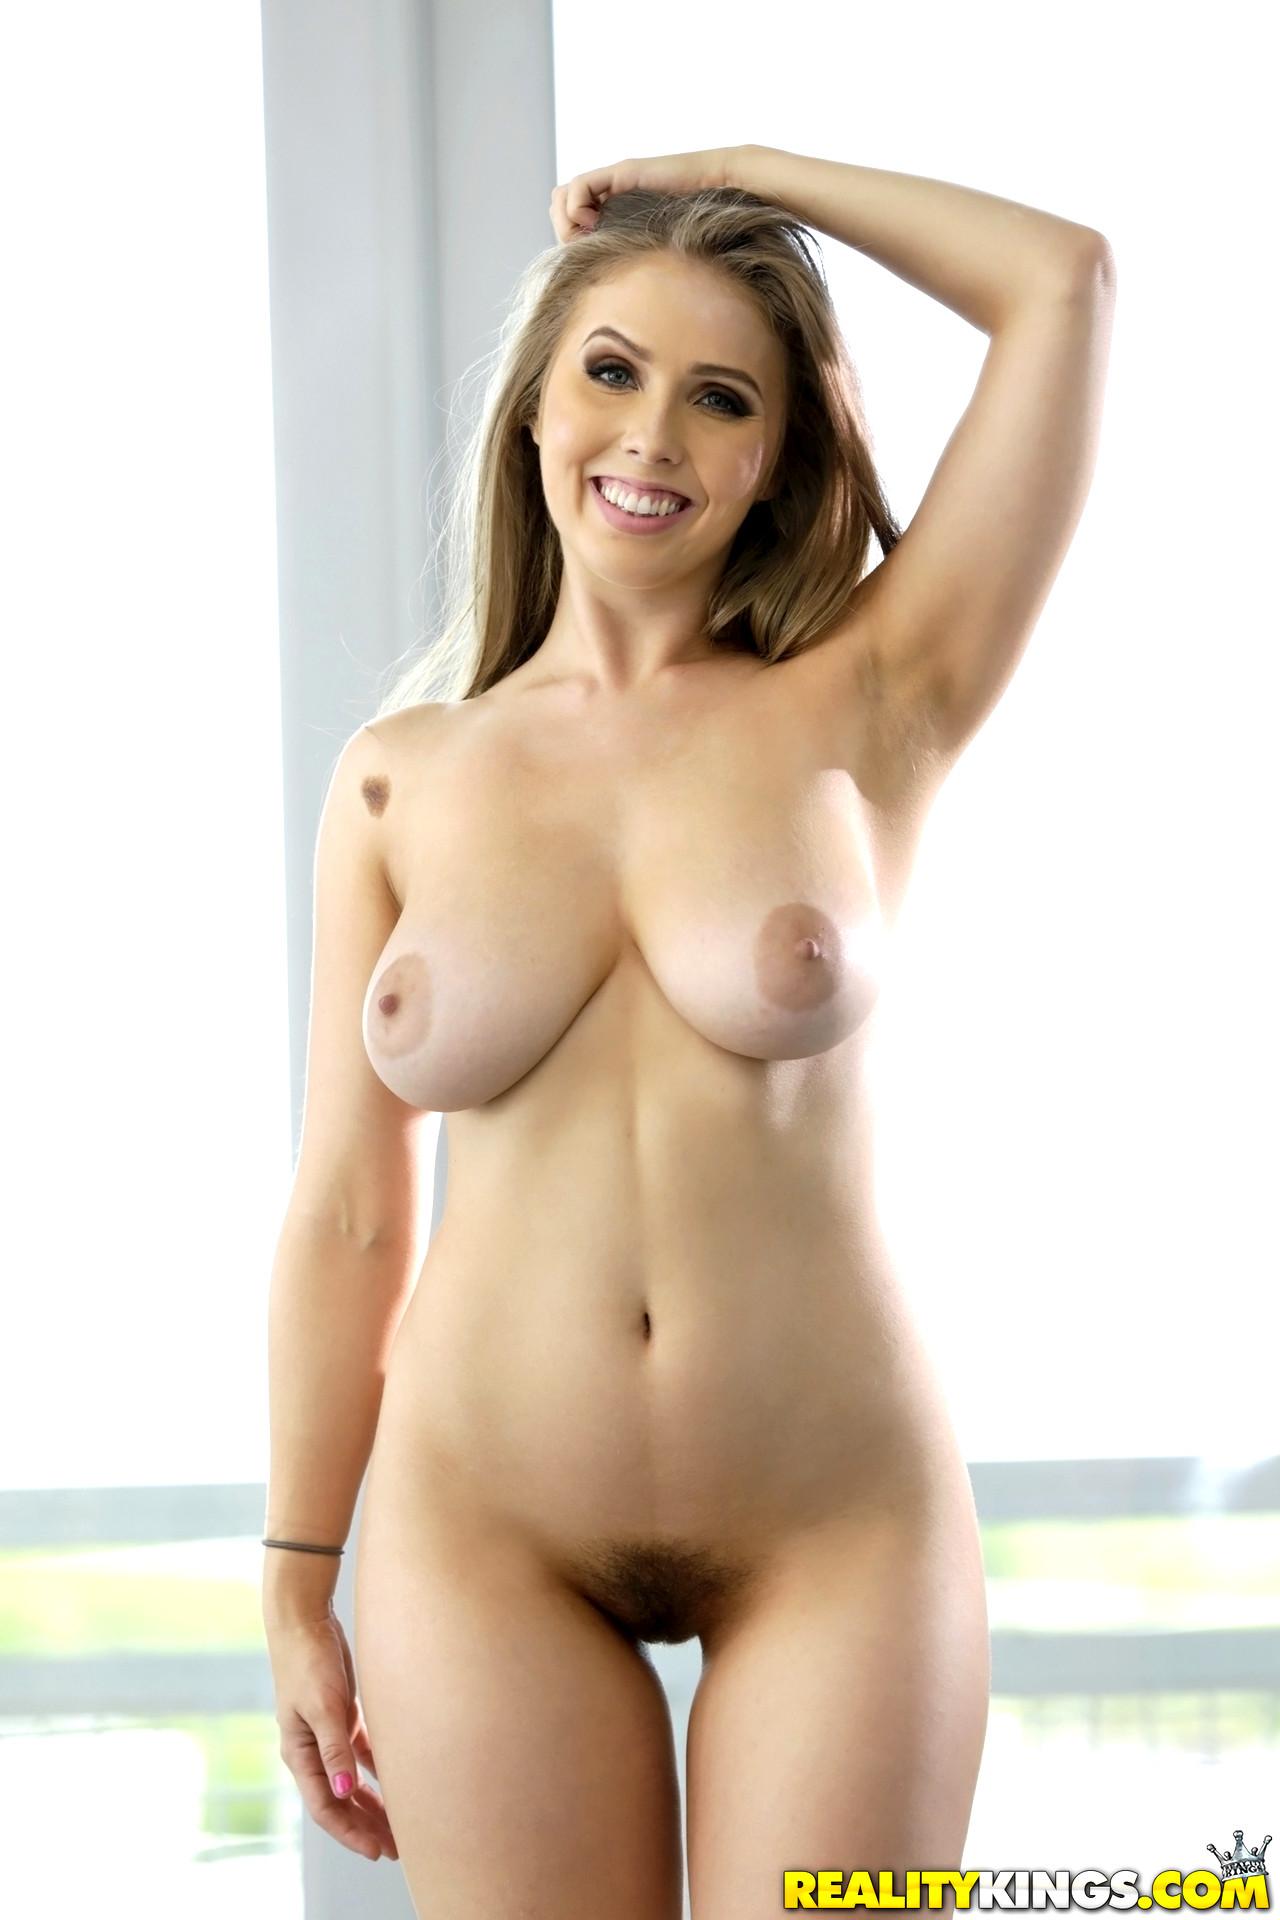 Lena paul tits+facial